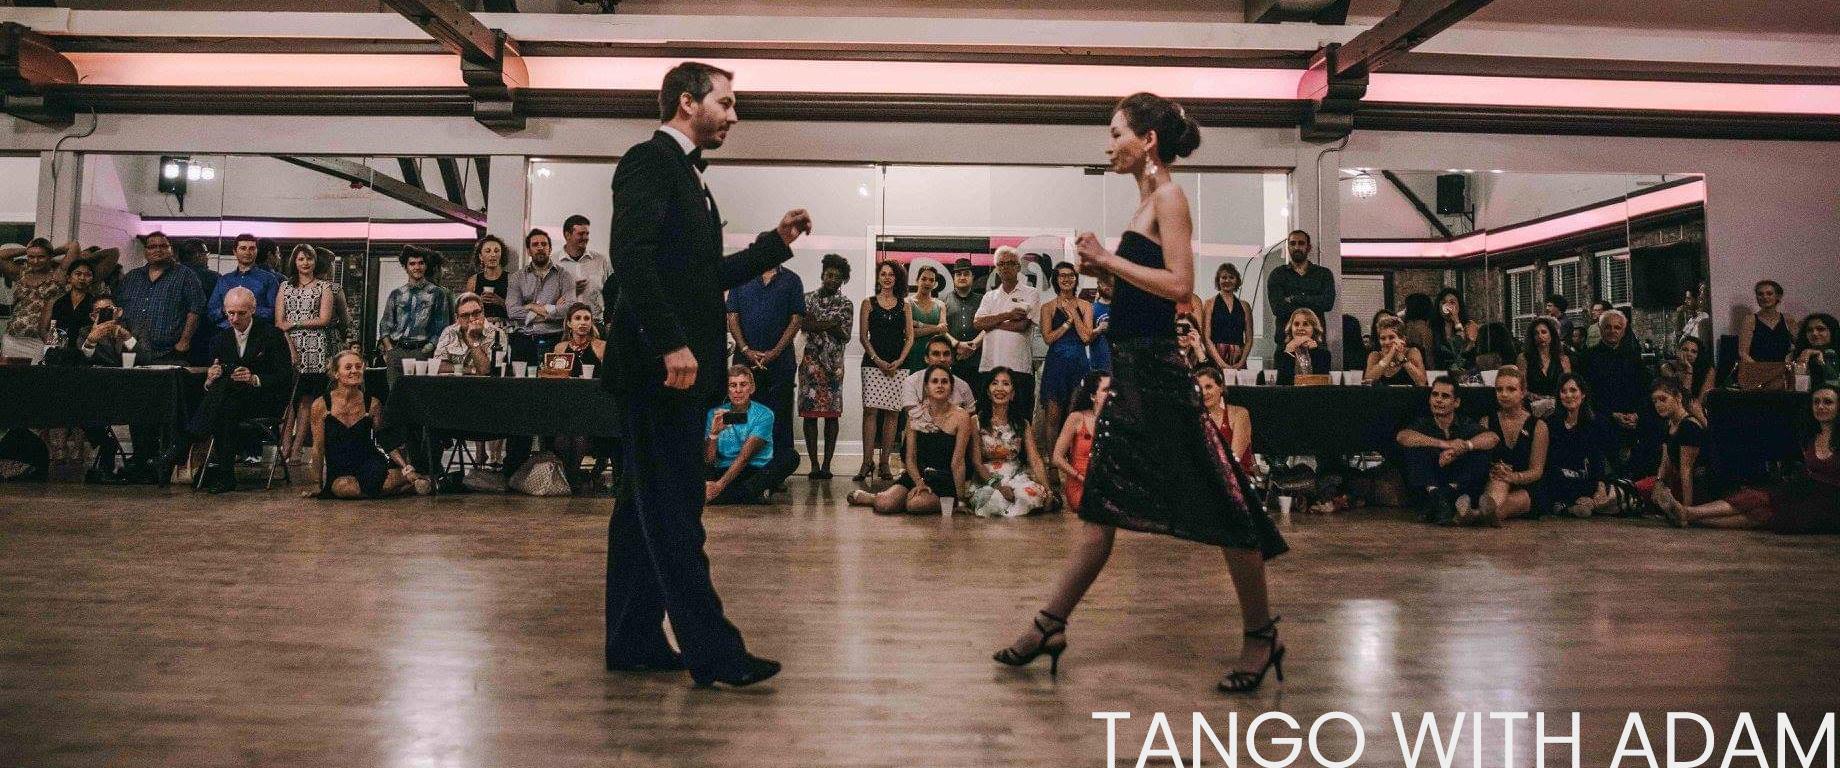 Tango With Adam